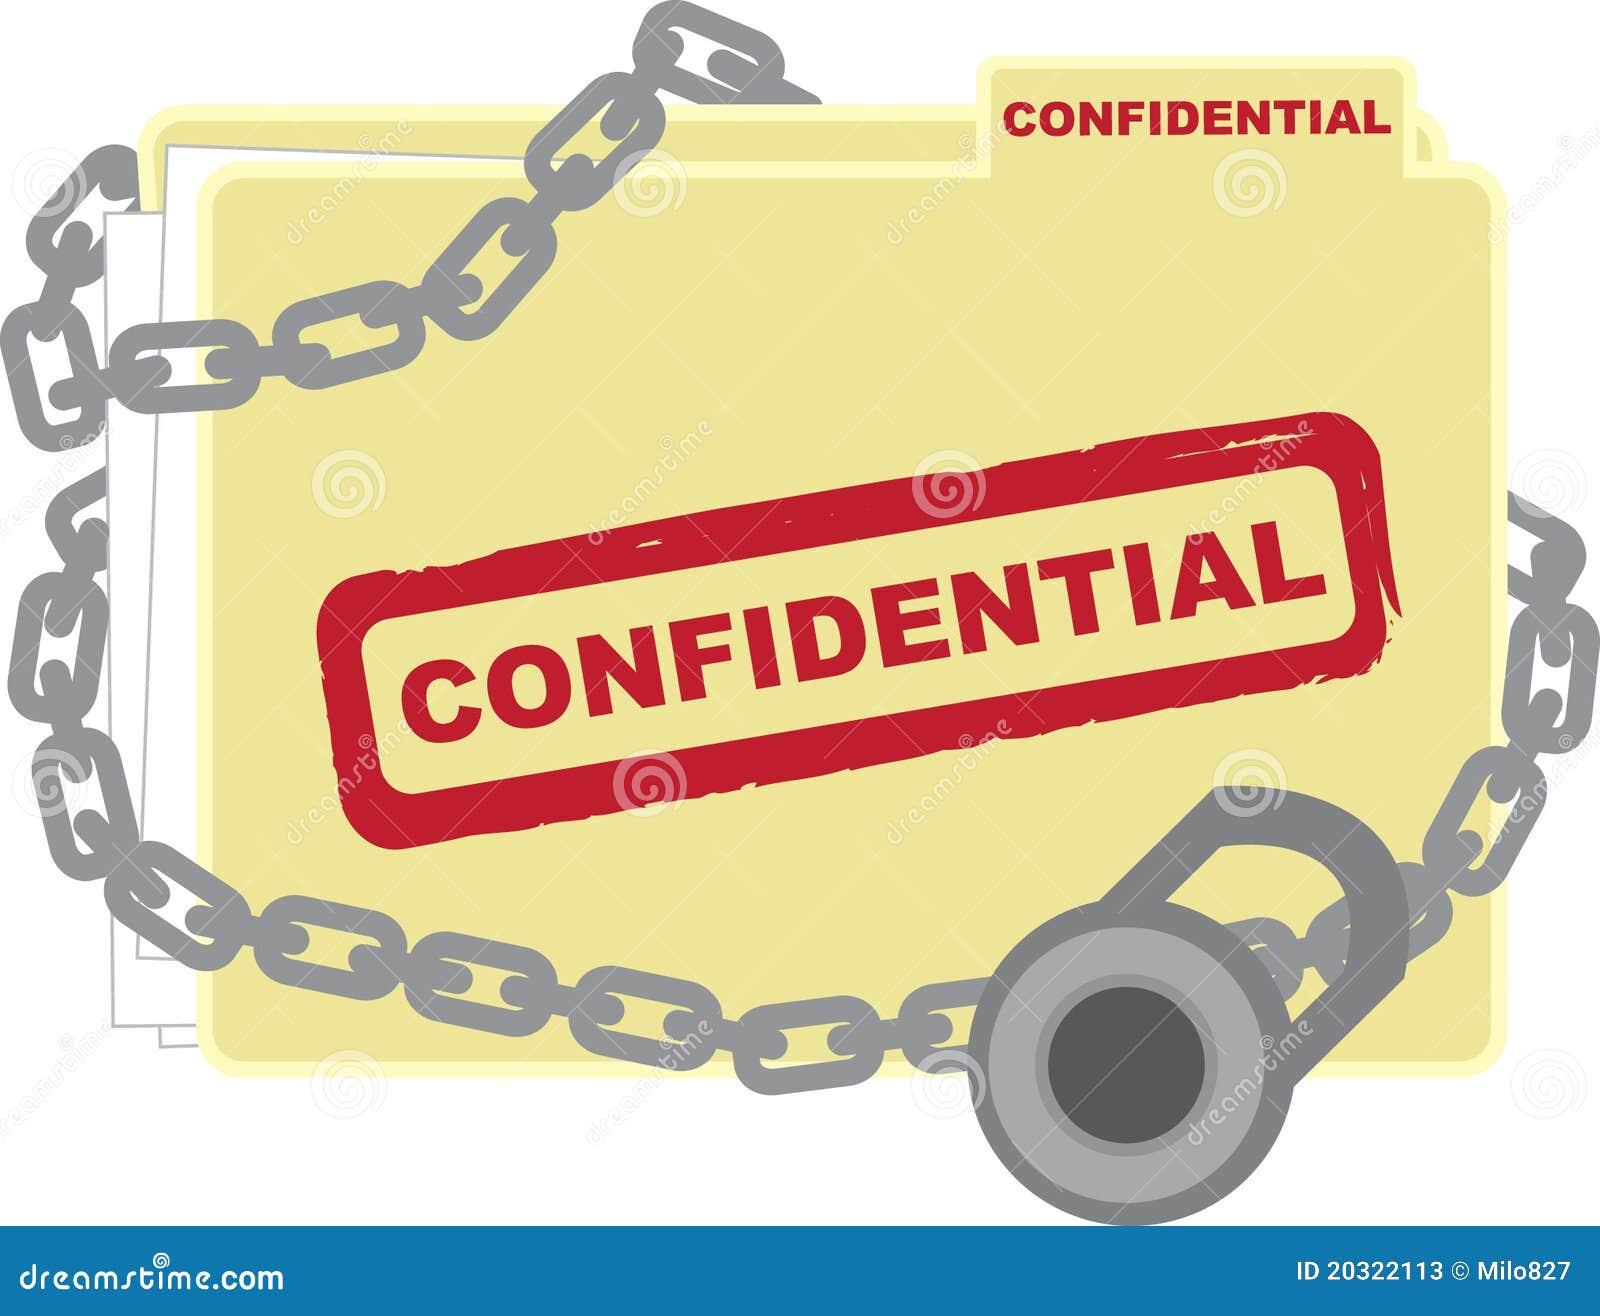 Confidential Folder Stock Photos - Image: 20322113